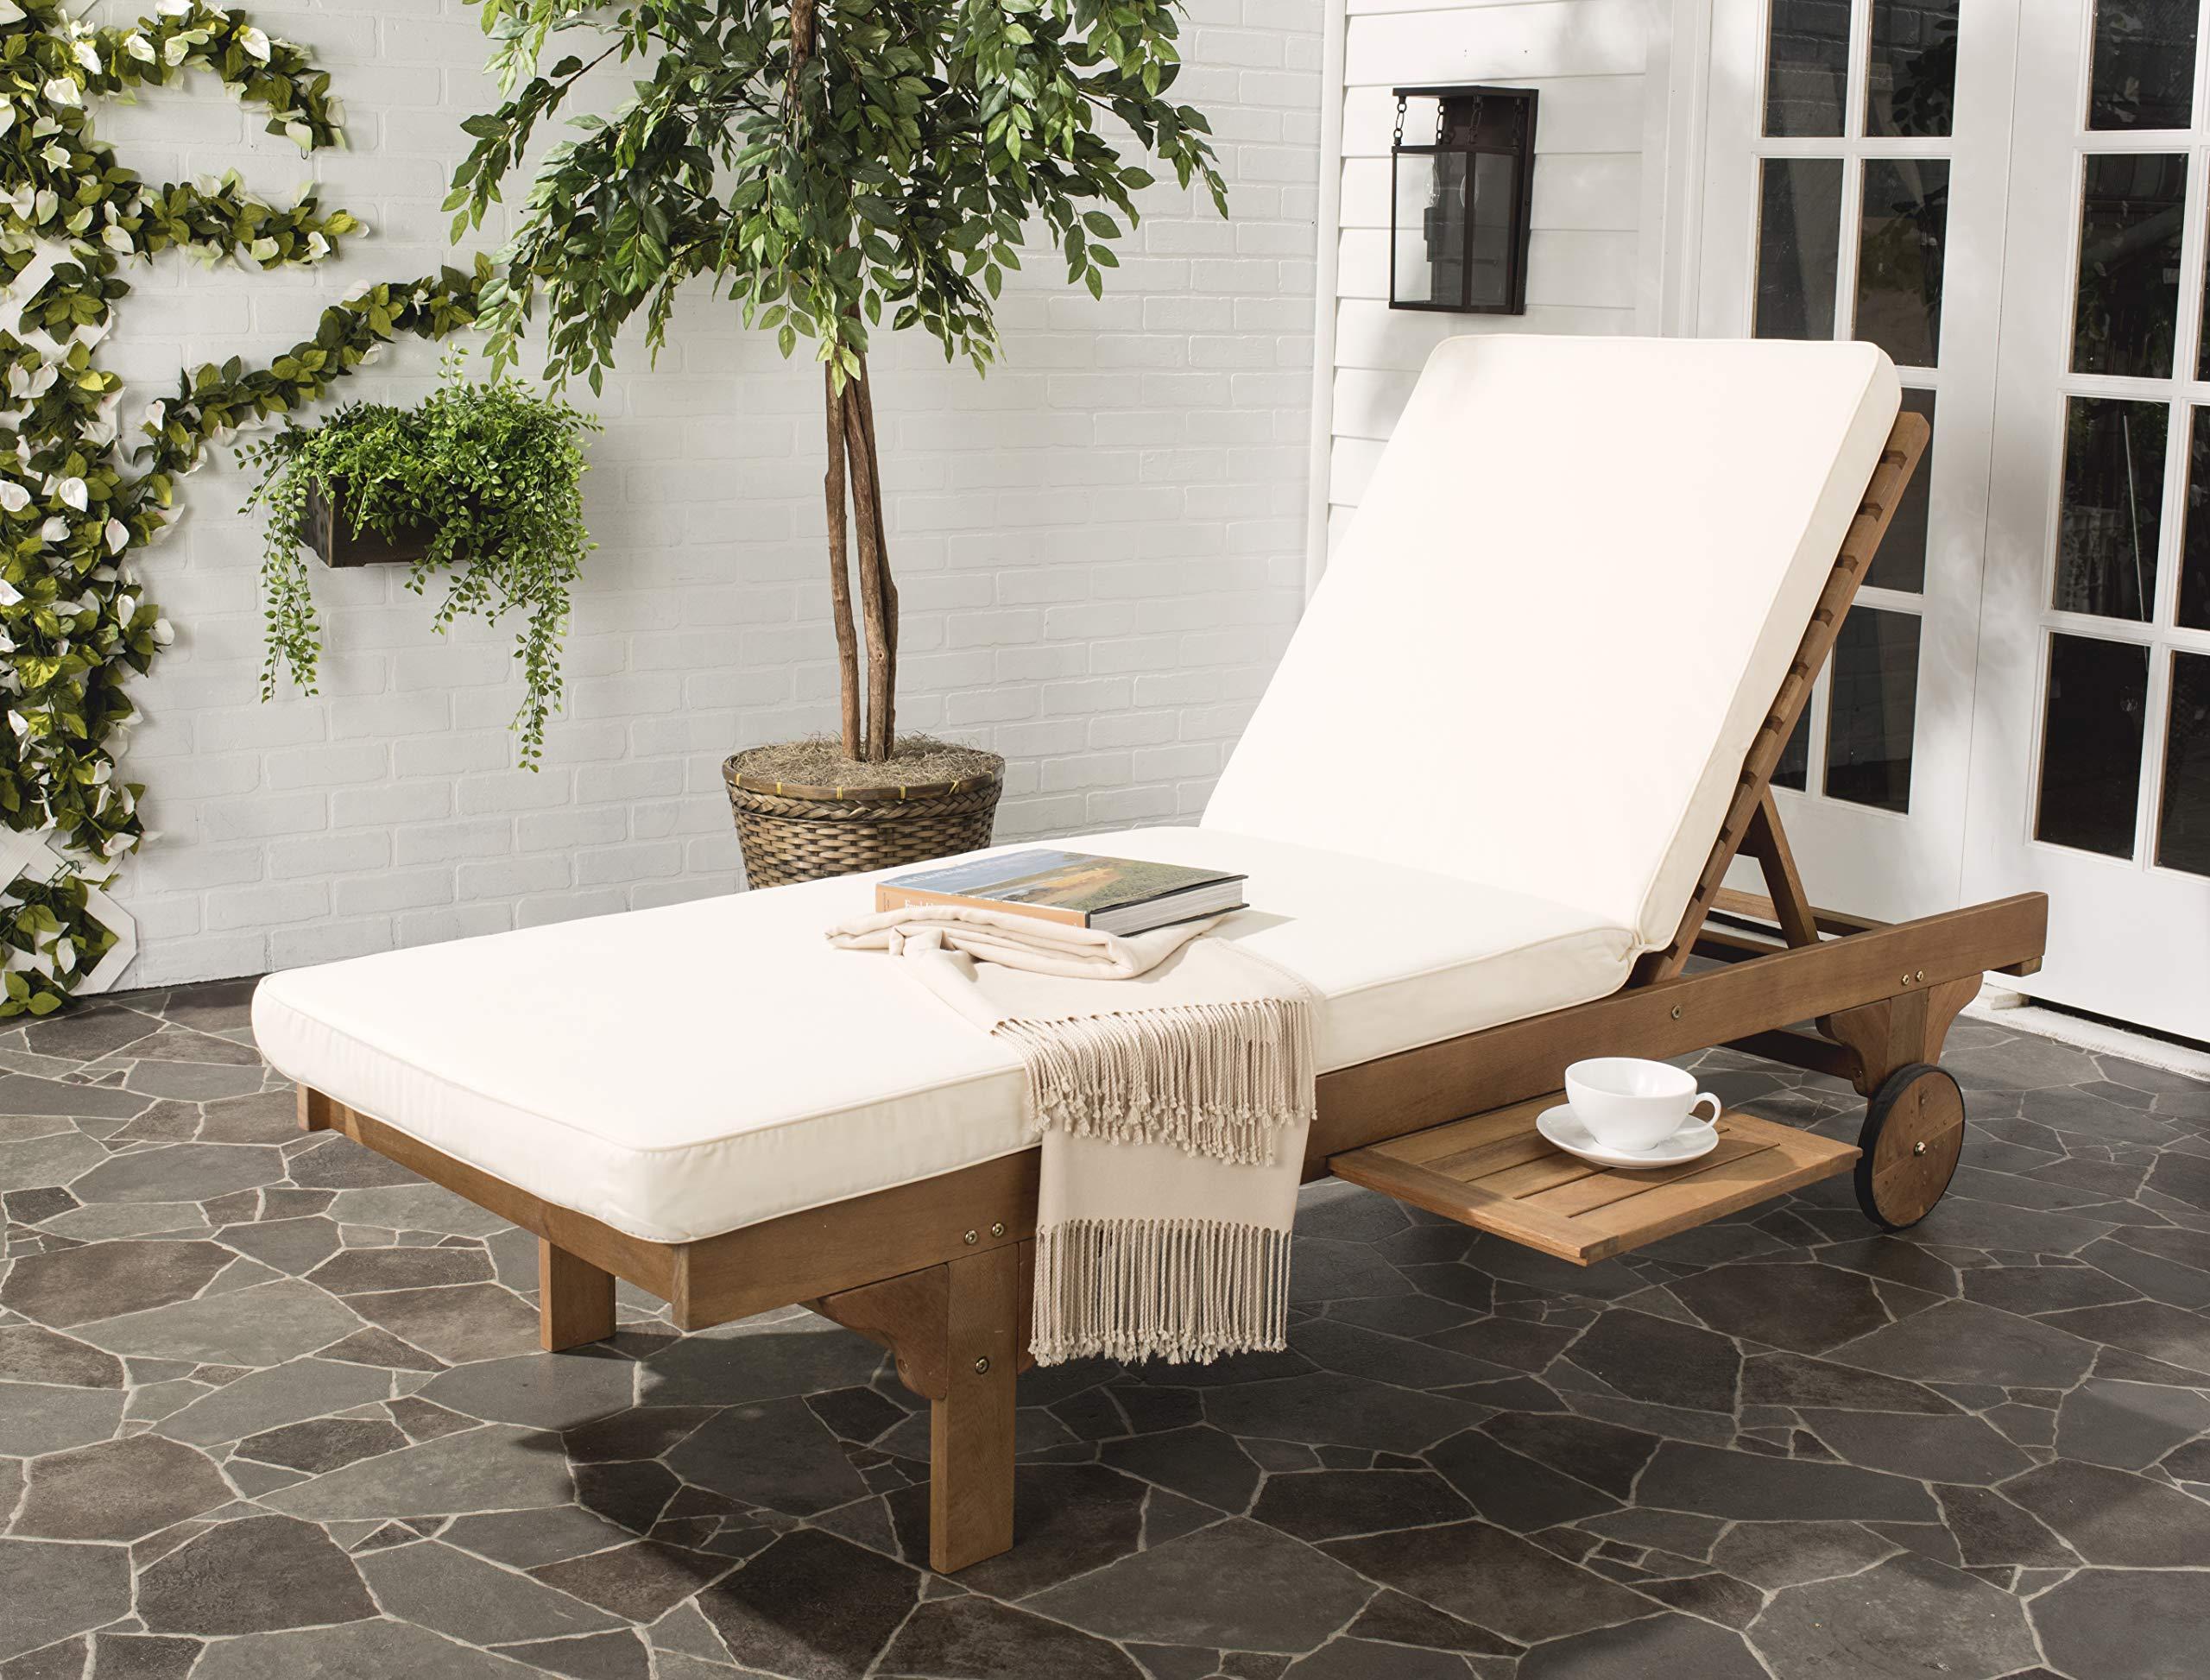 Safavieh PAT7022C Newport Chaise Lounge Chair, Natural/Beige